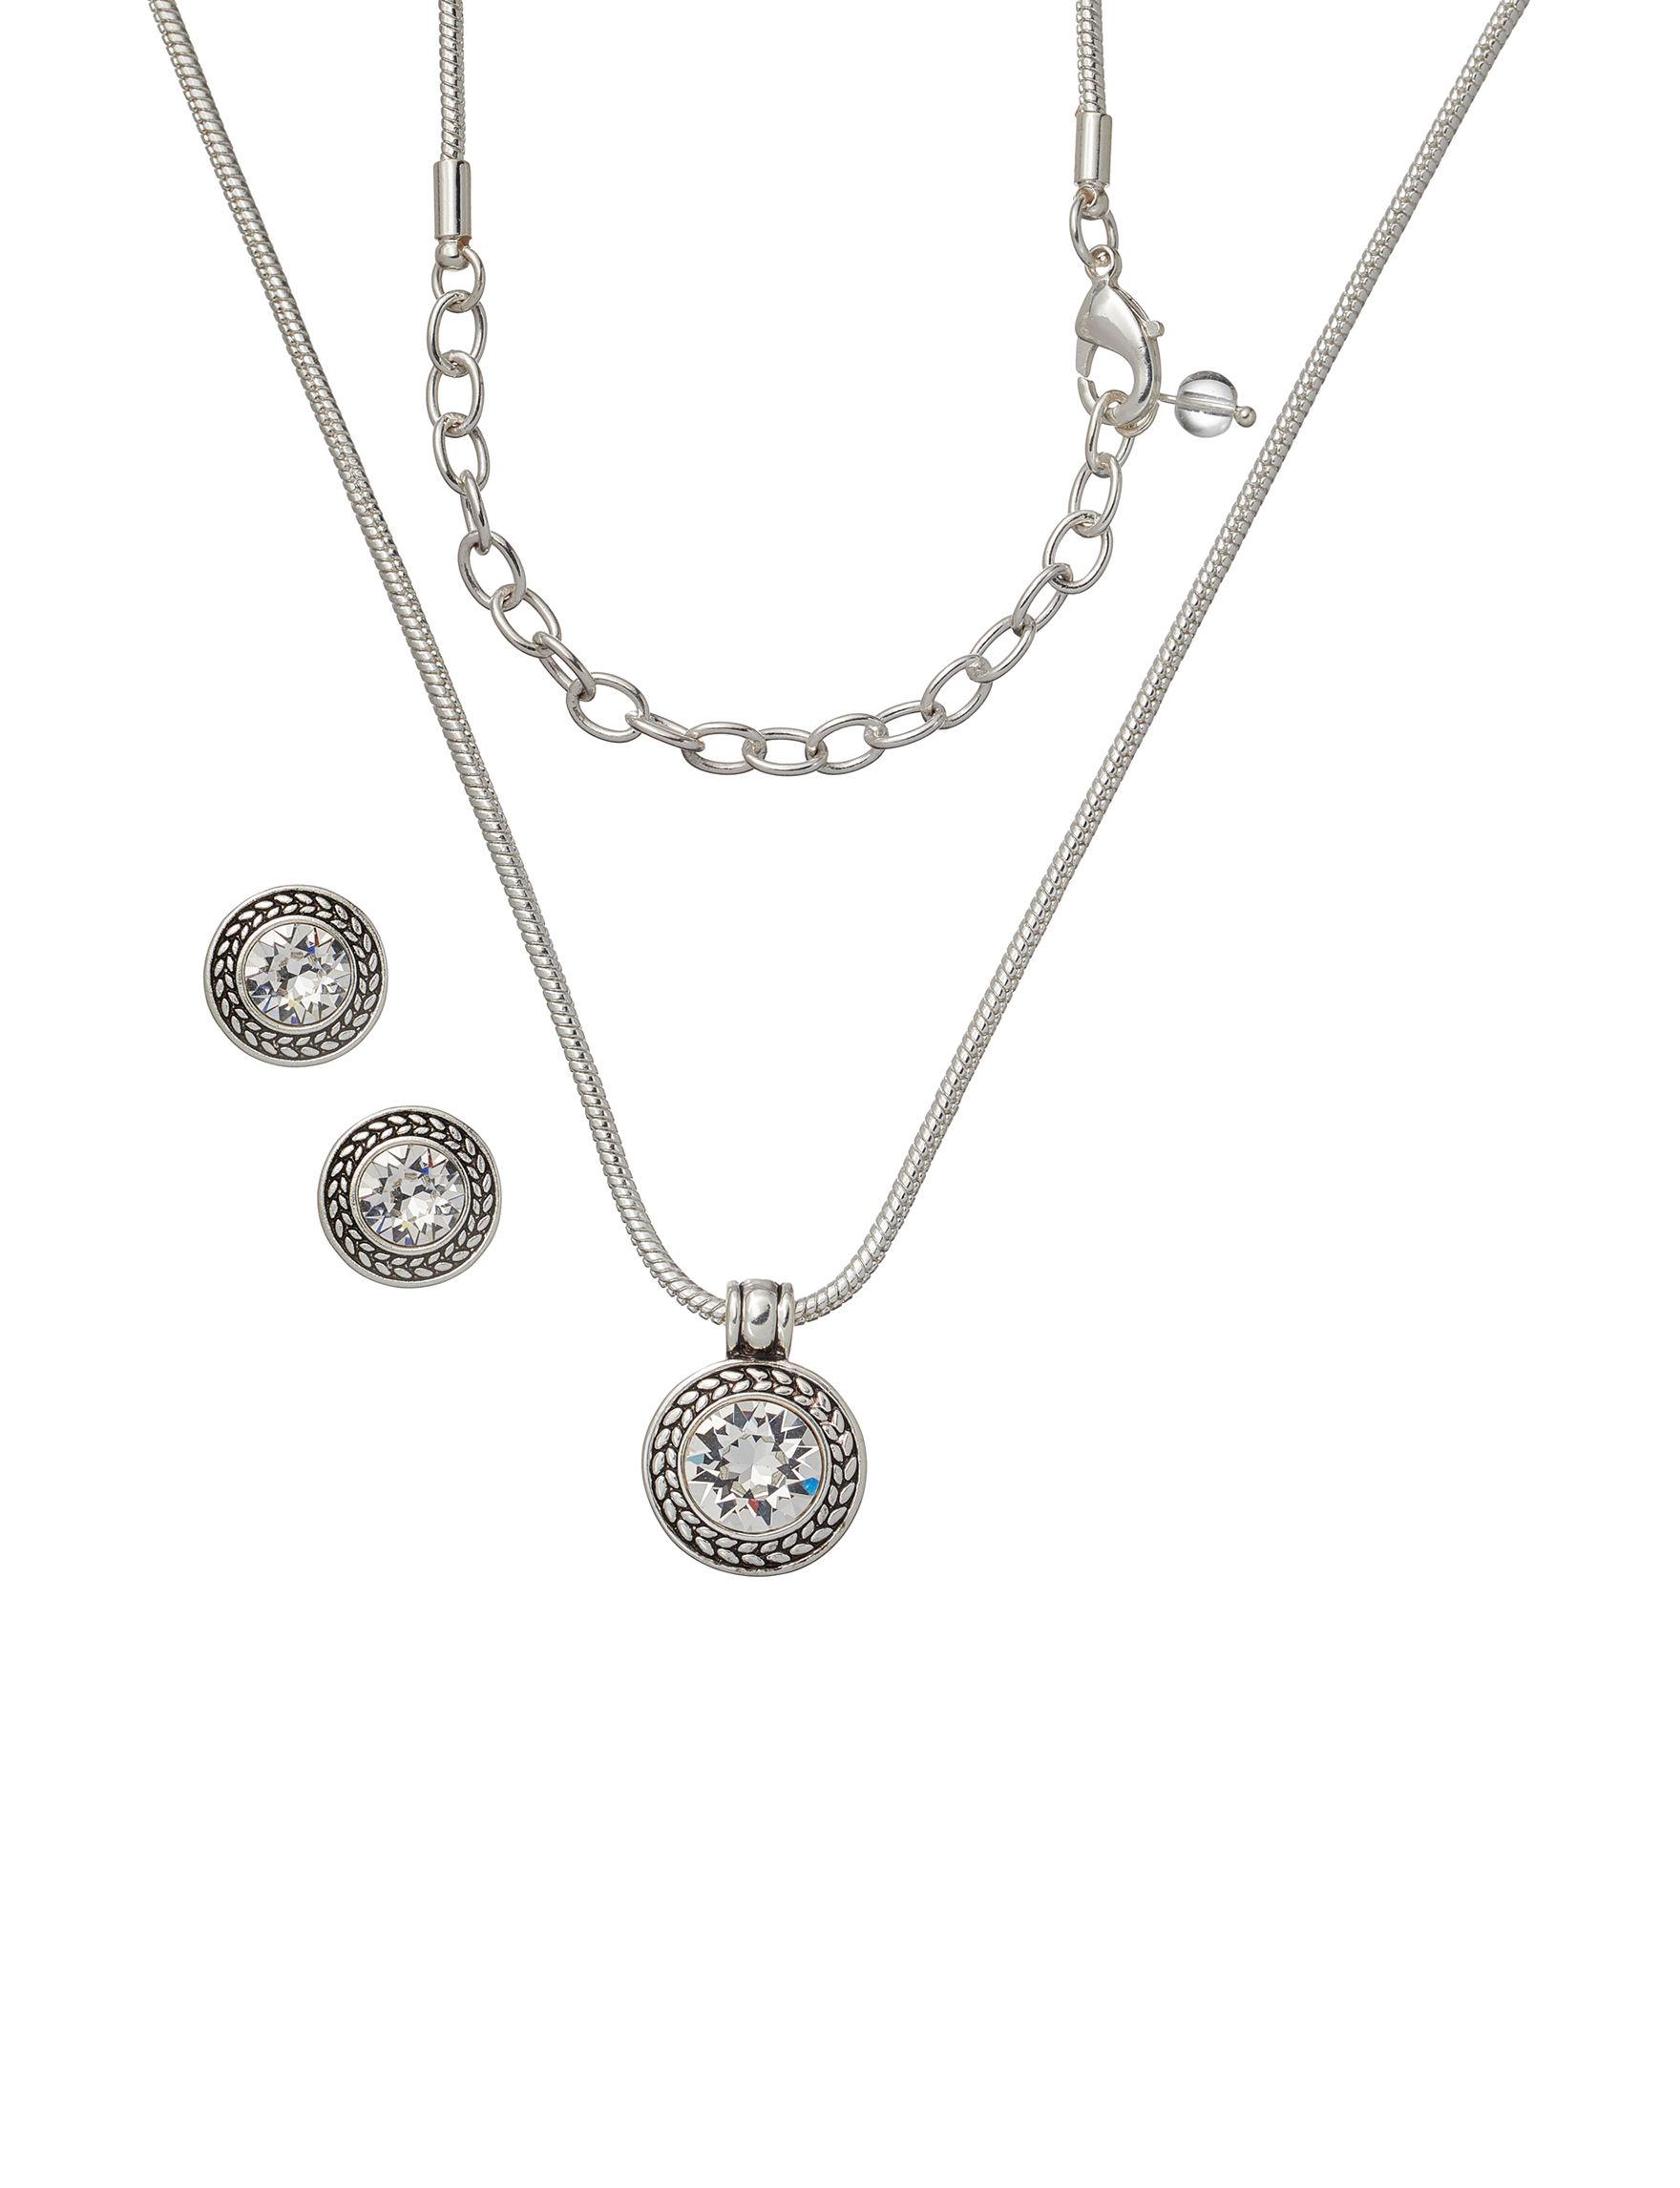 Napier Silver / Crystal Jewelry Sets Fashion Jewelry